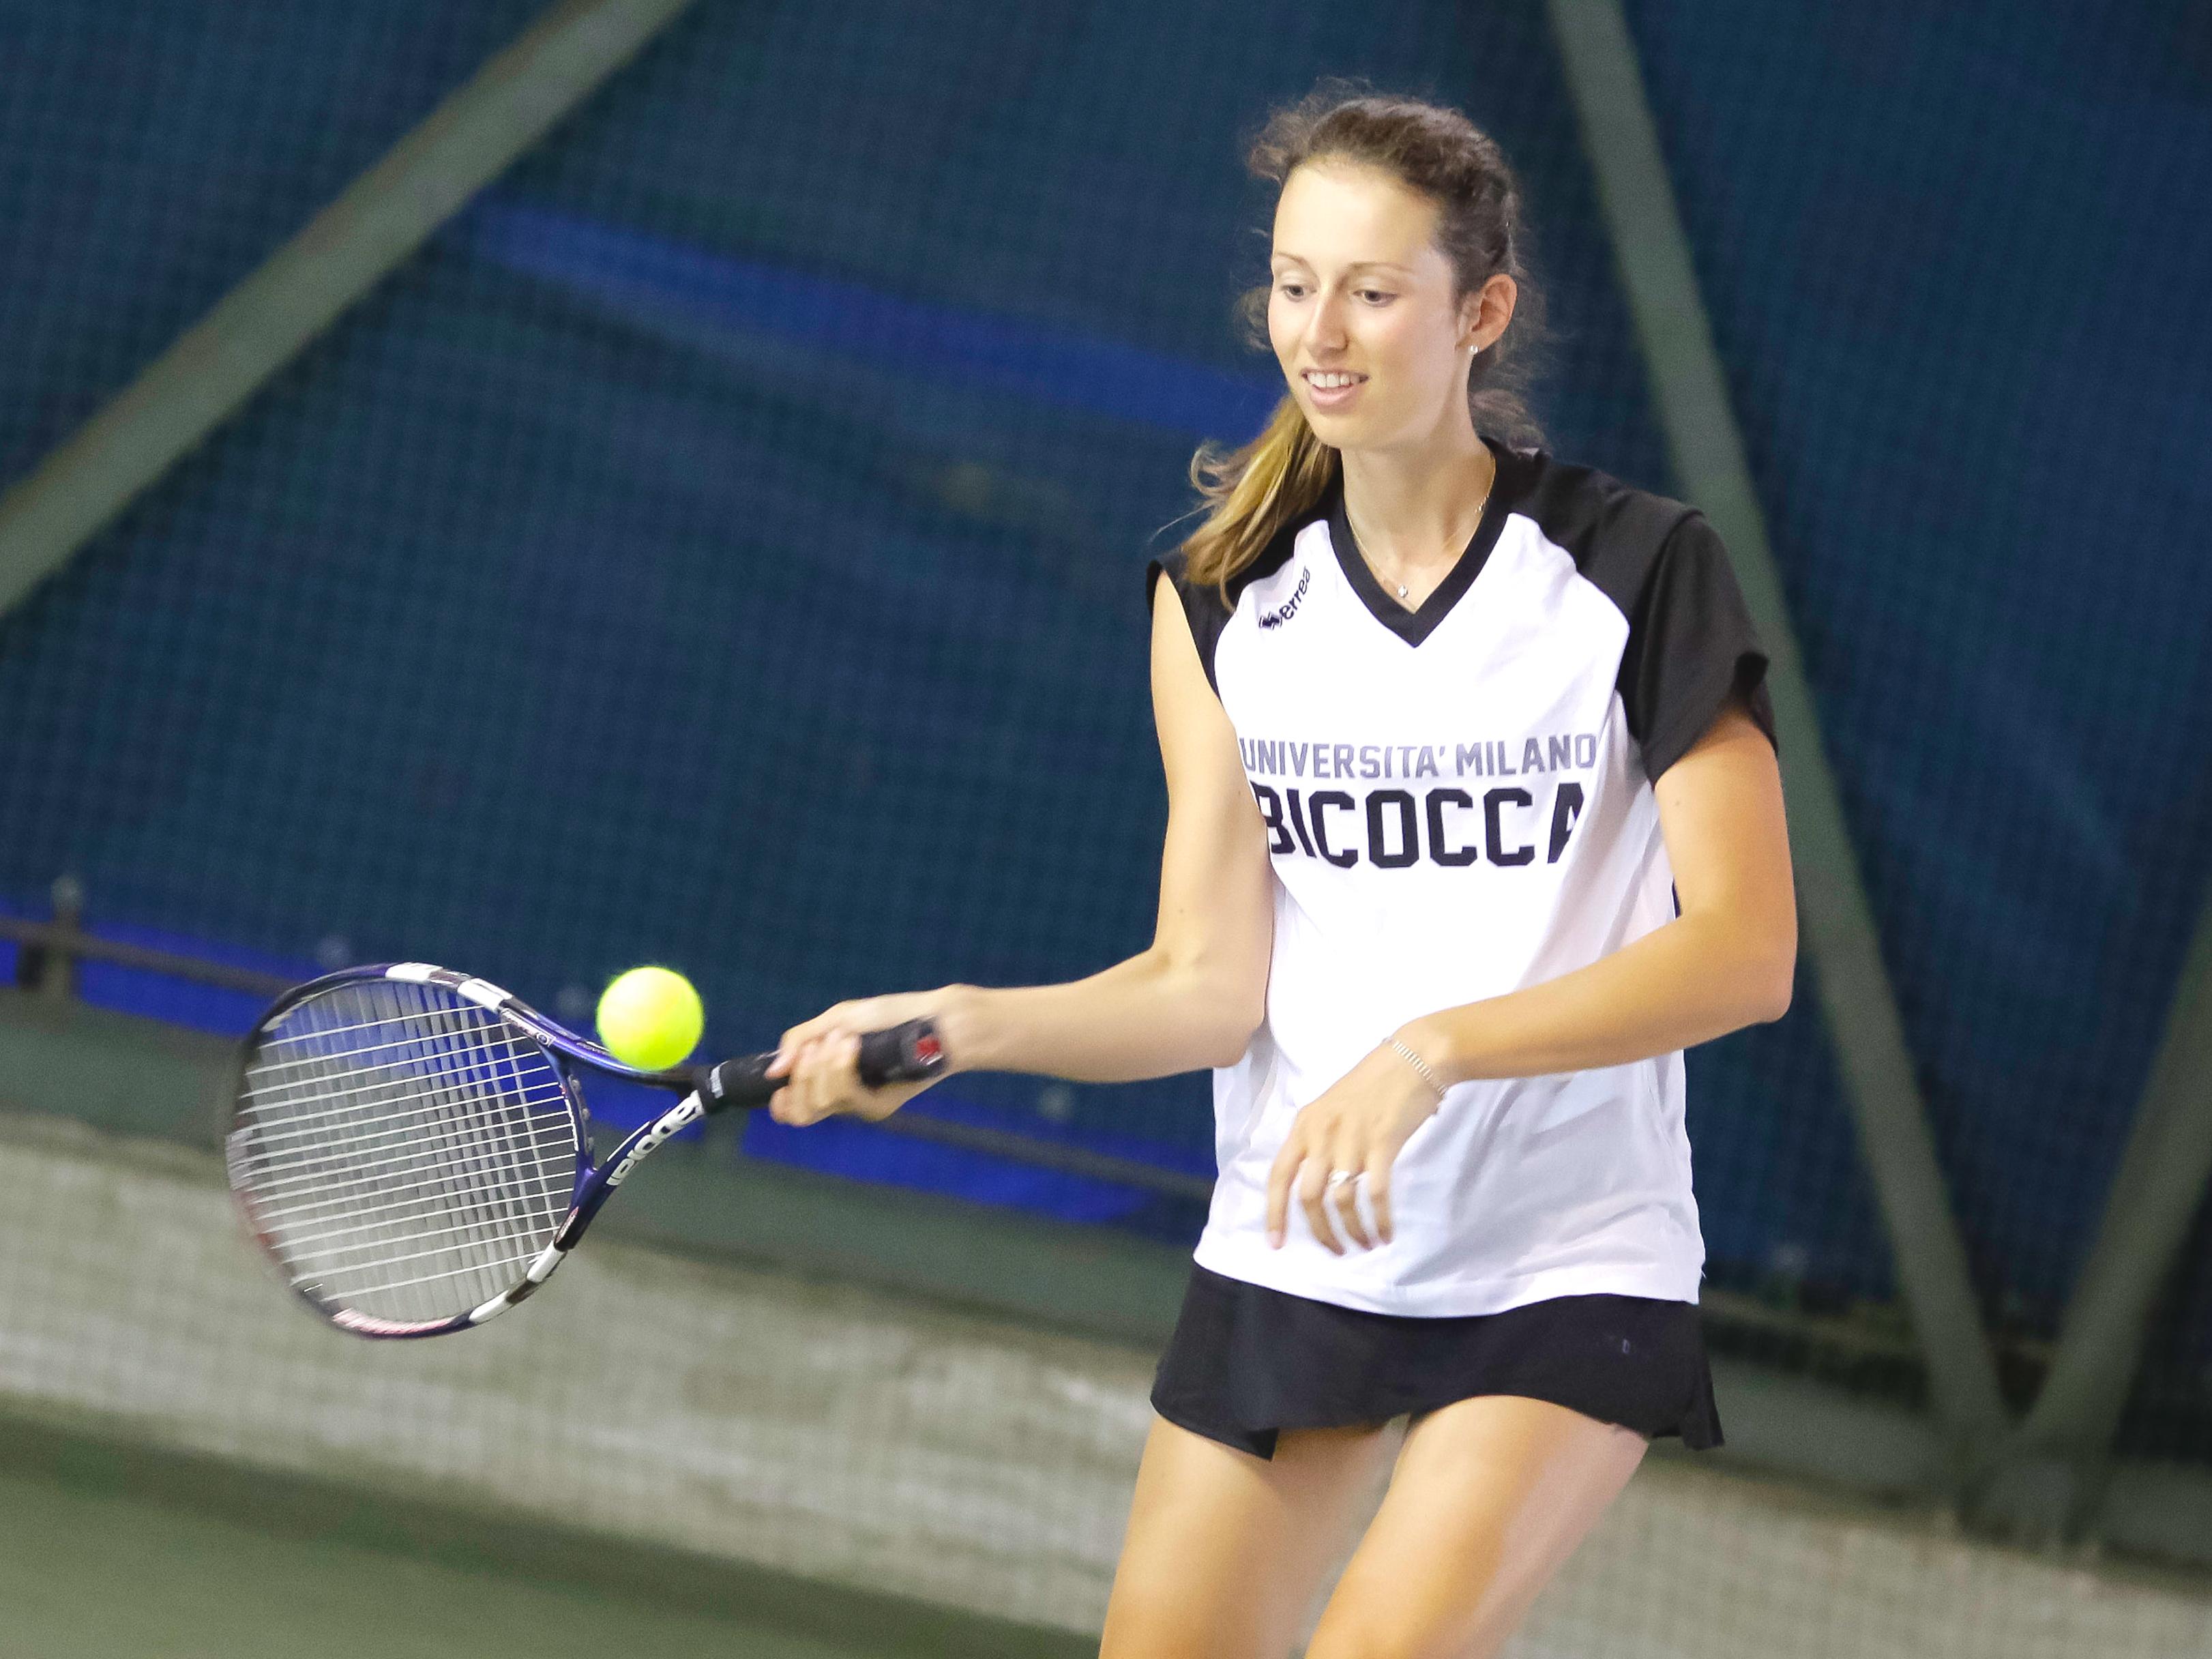 Sport Bicocca: TENNIS